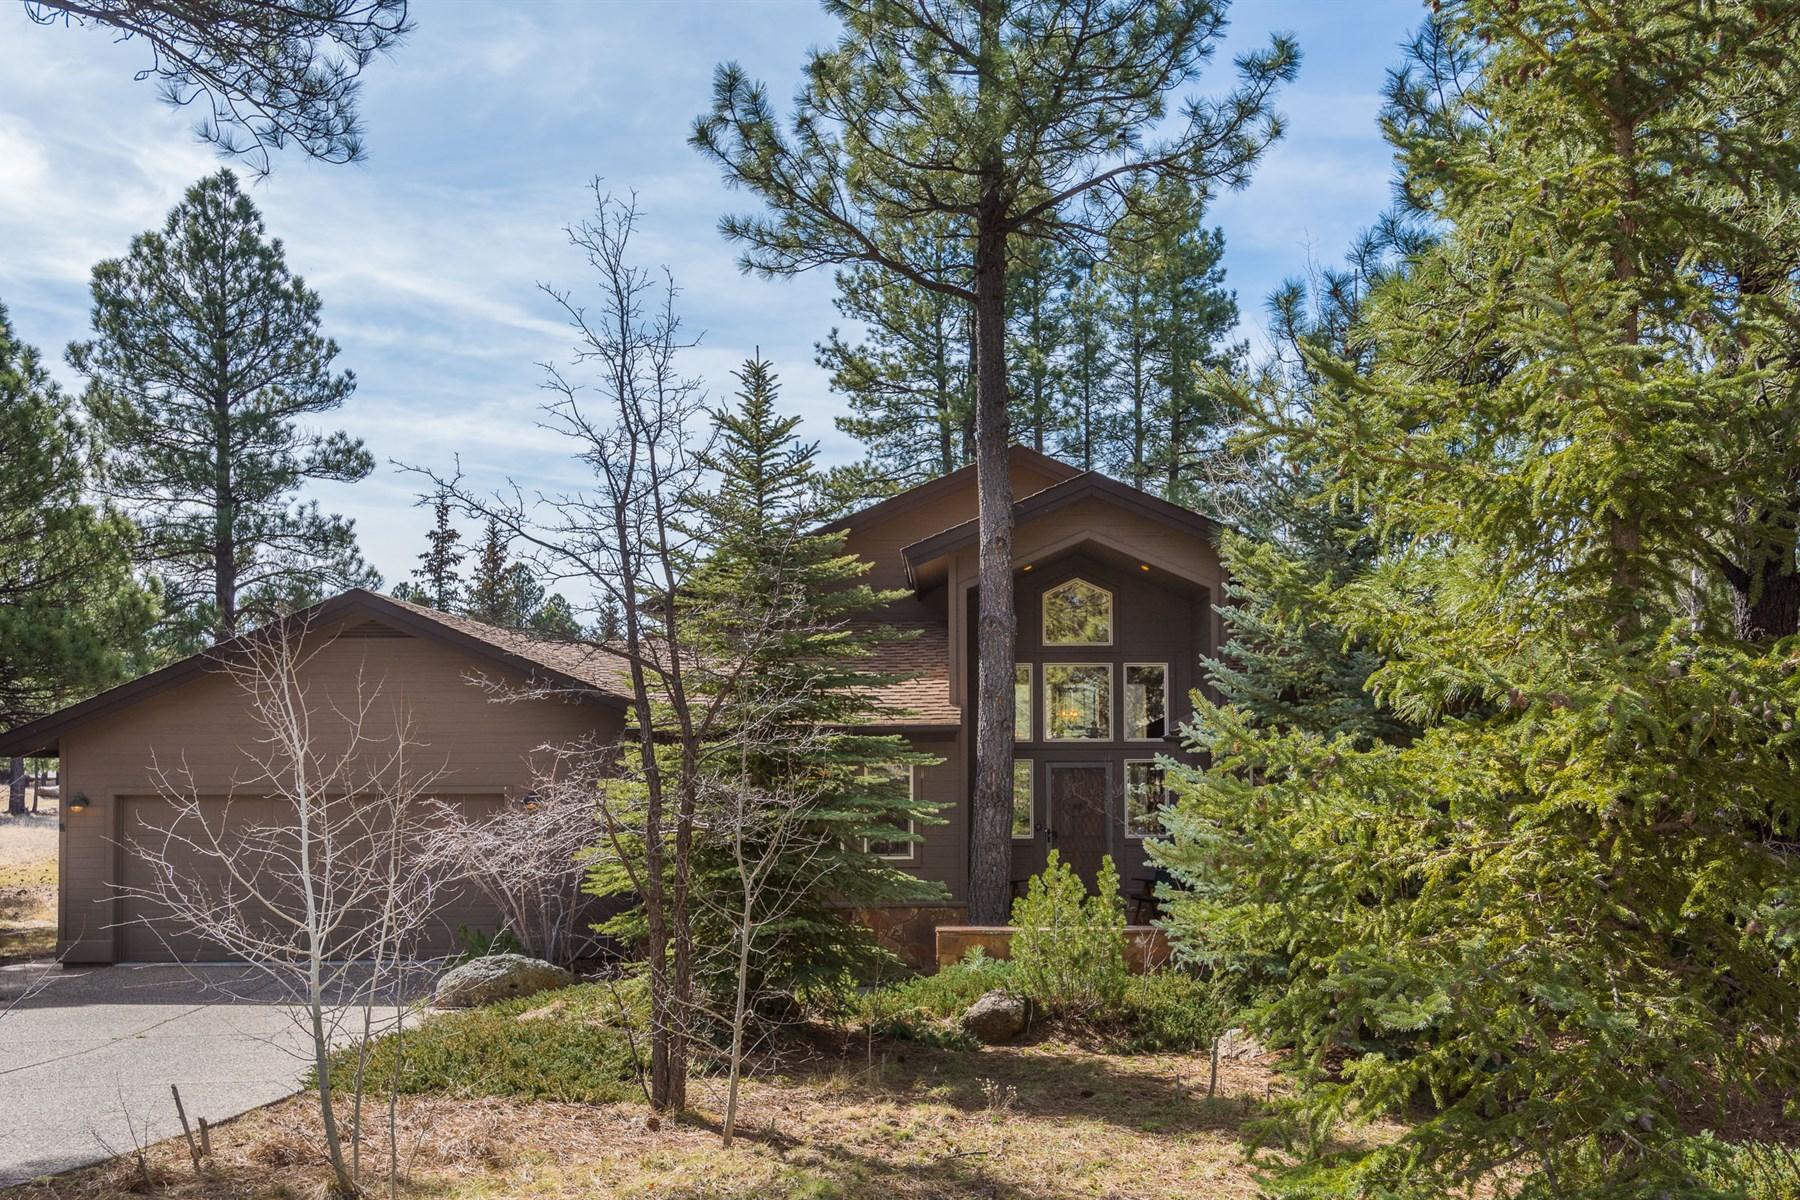 独户住宅 为 销售 在 wonderful single level home 2292 Bev Miller Flagstaff, 亚利桑那州 86005 美国